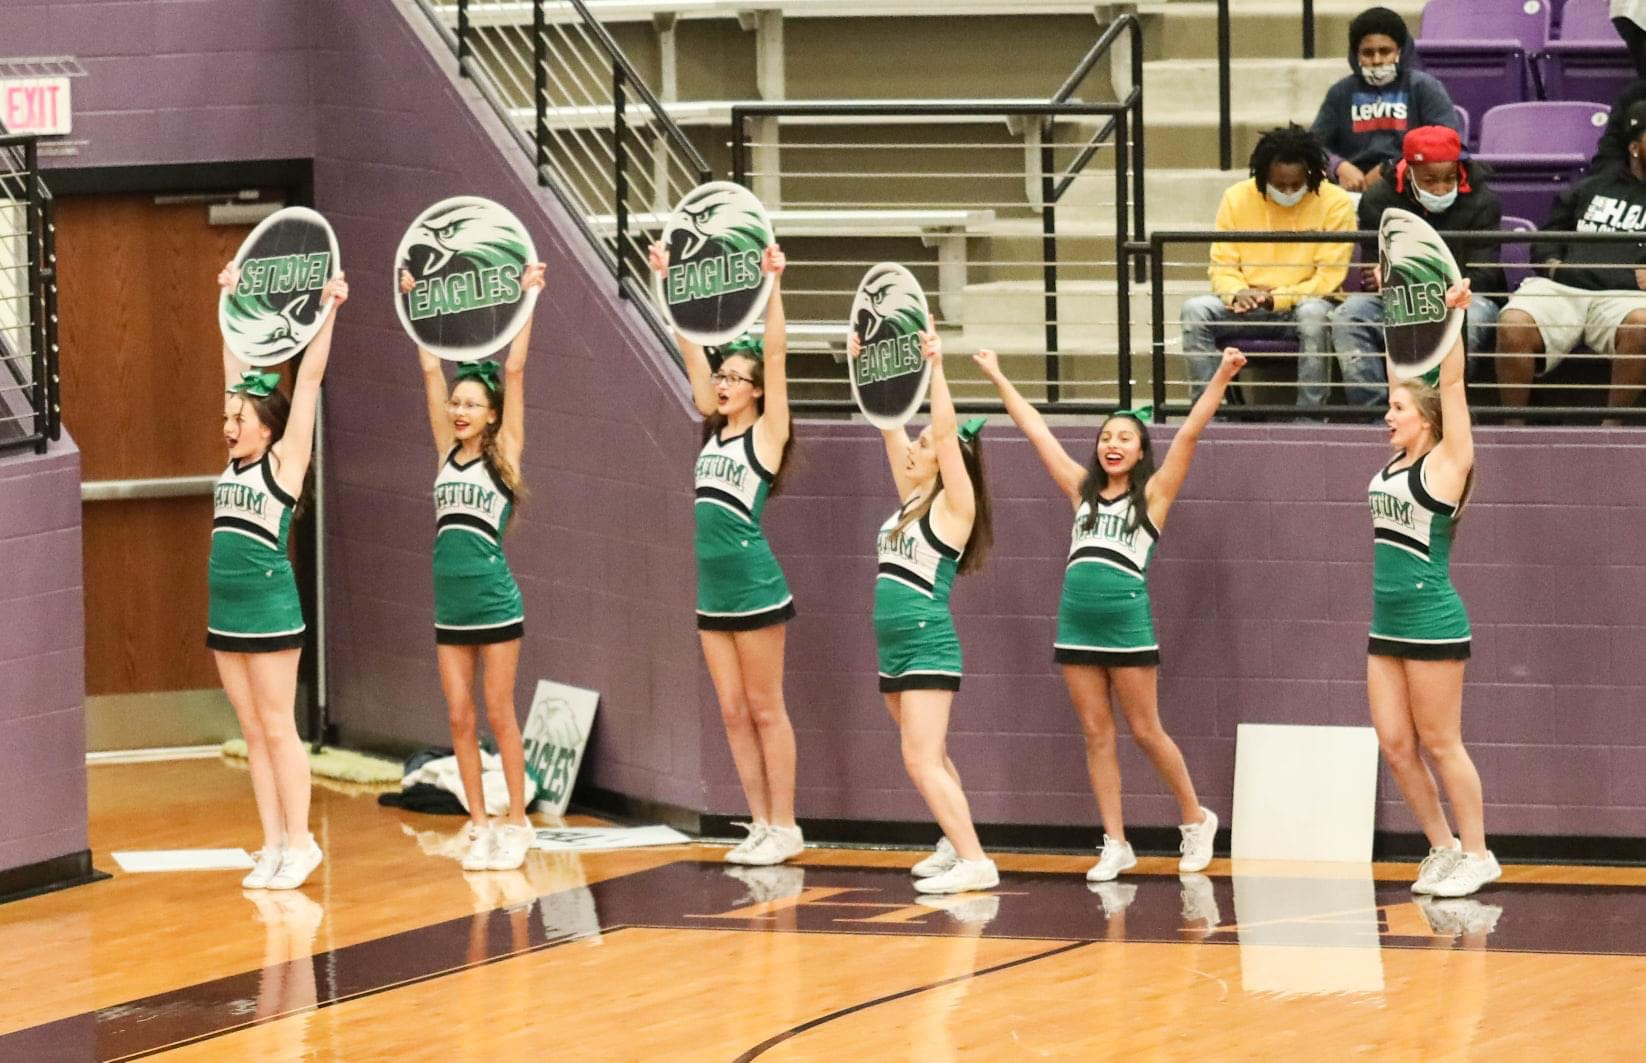 Cheer Group